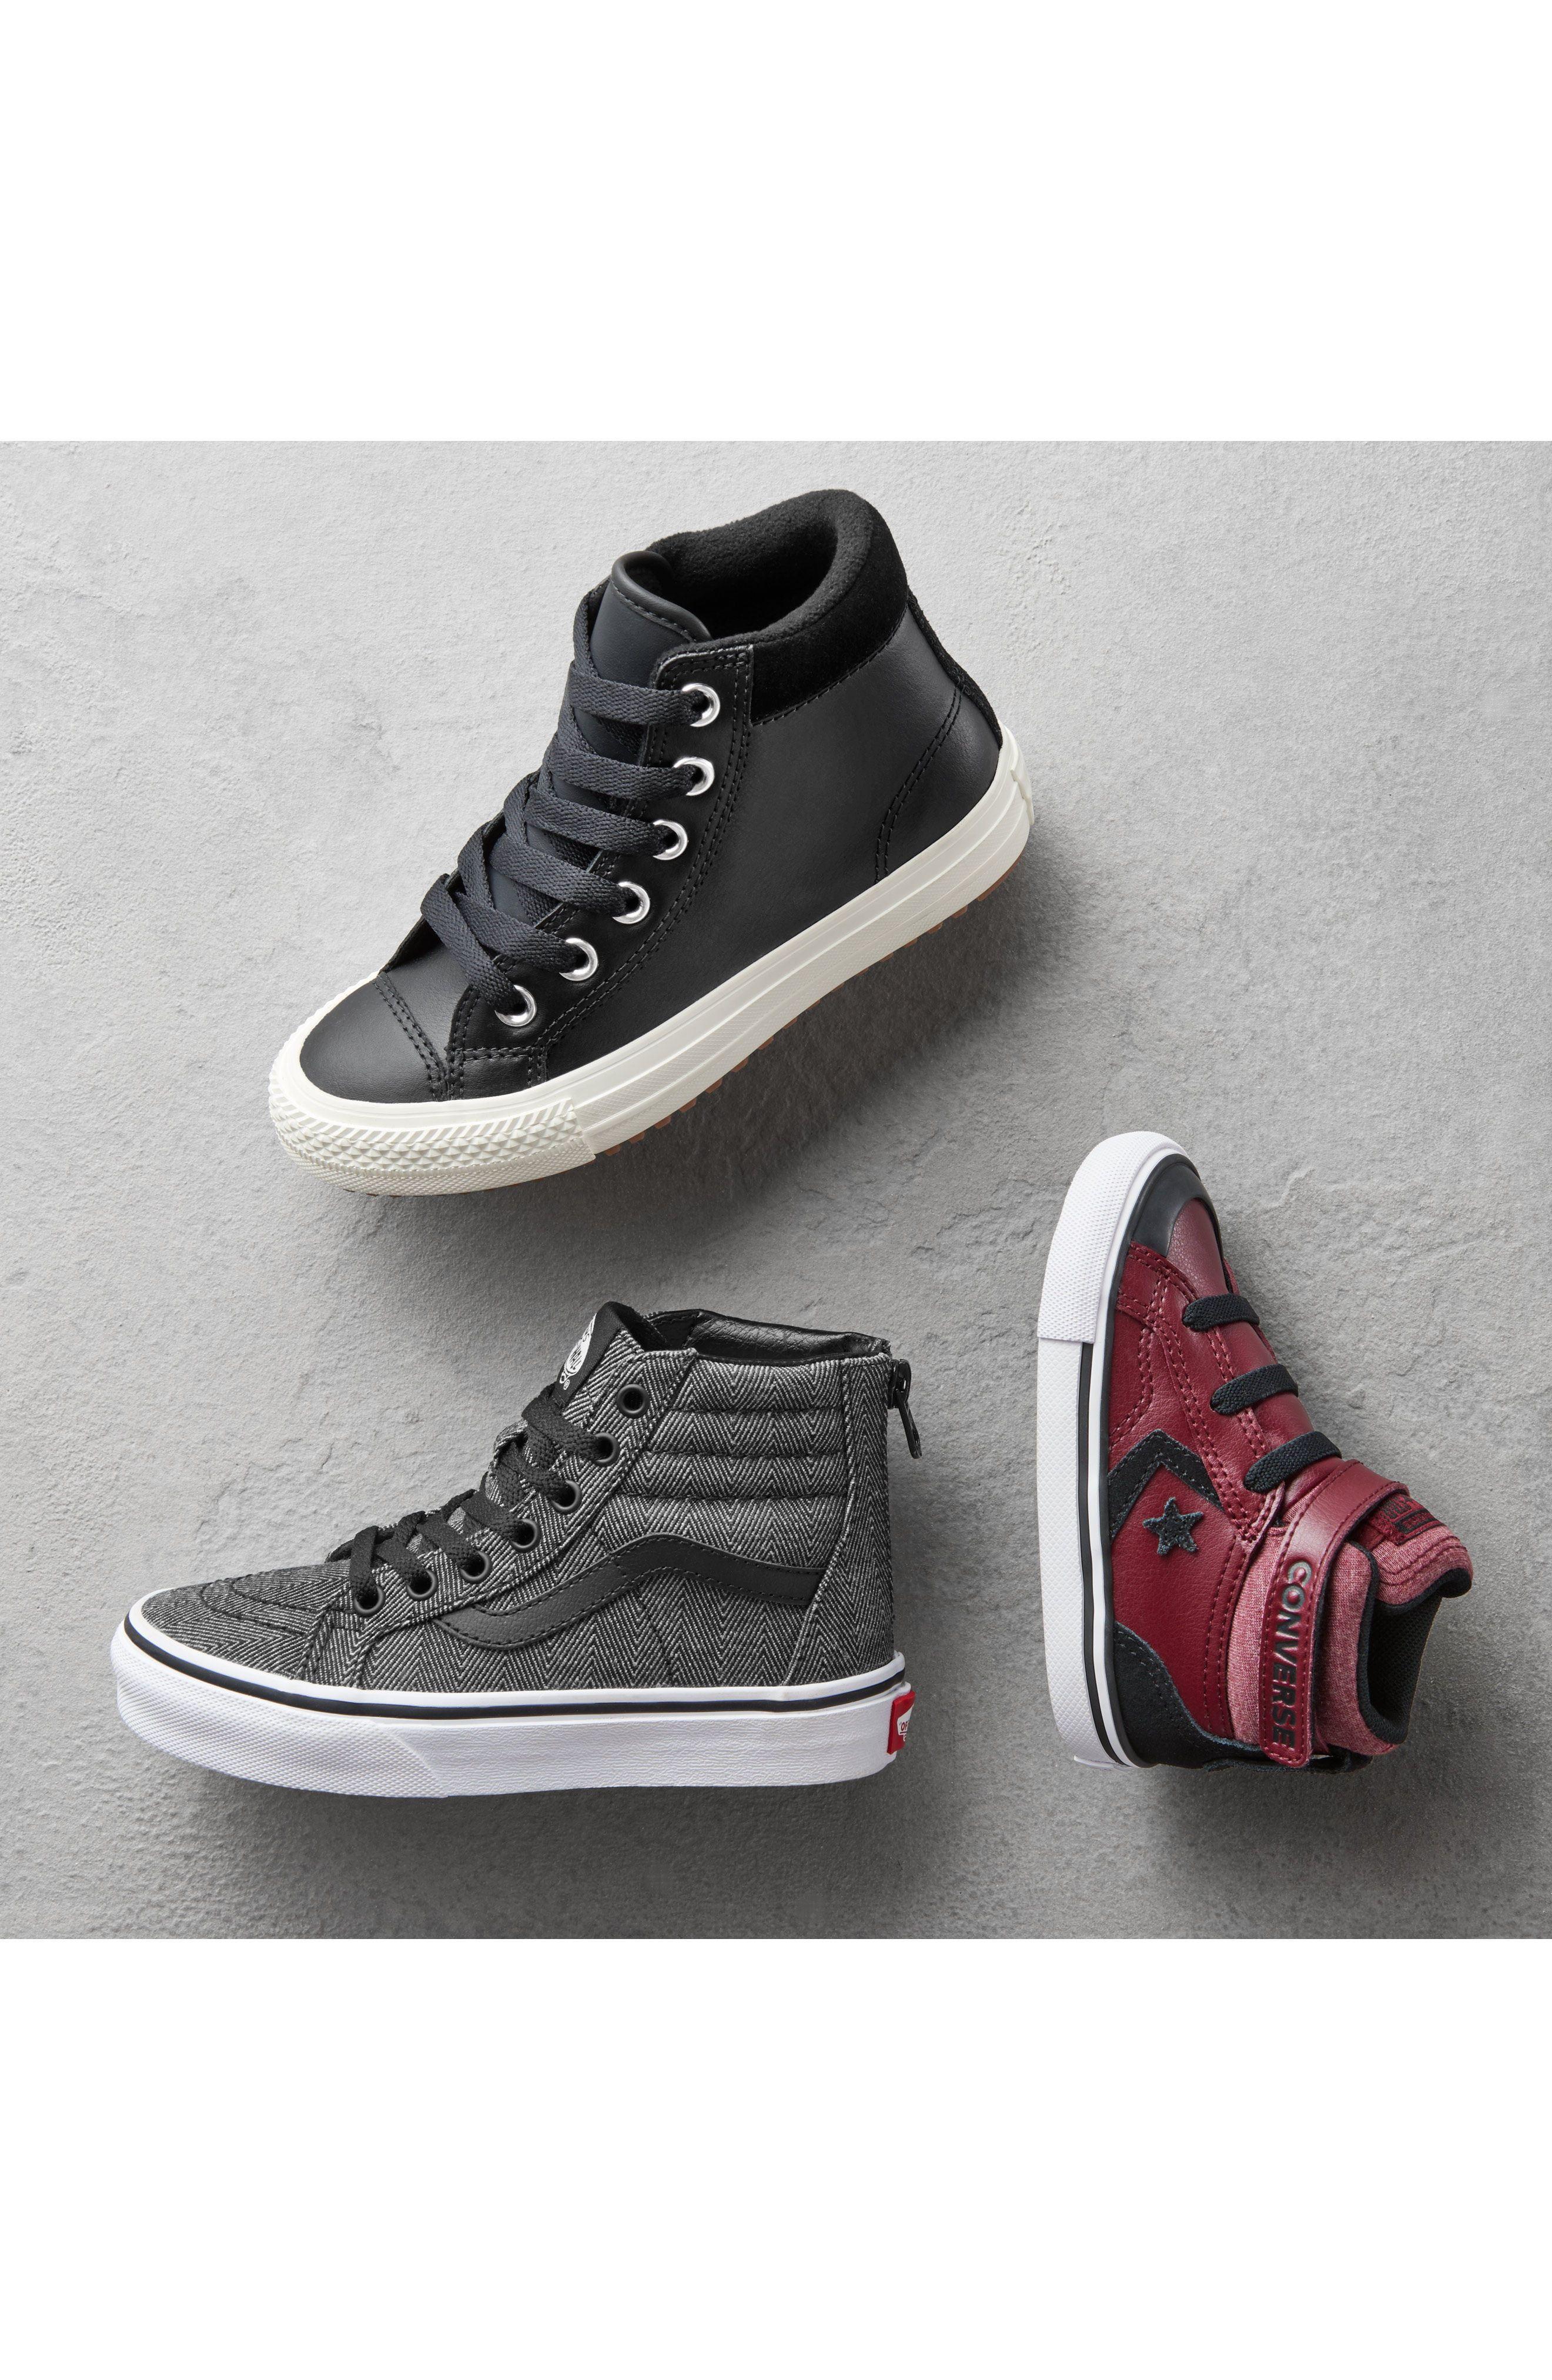 Converse Pro Blaze High Top Sneaker (Baby, Walker, Toddler